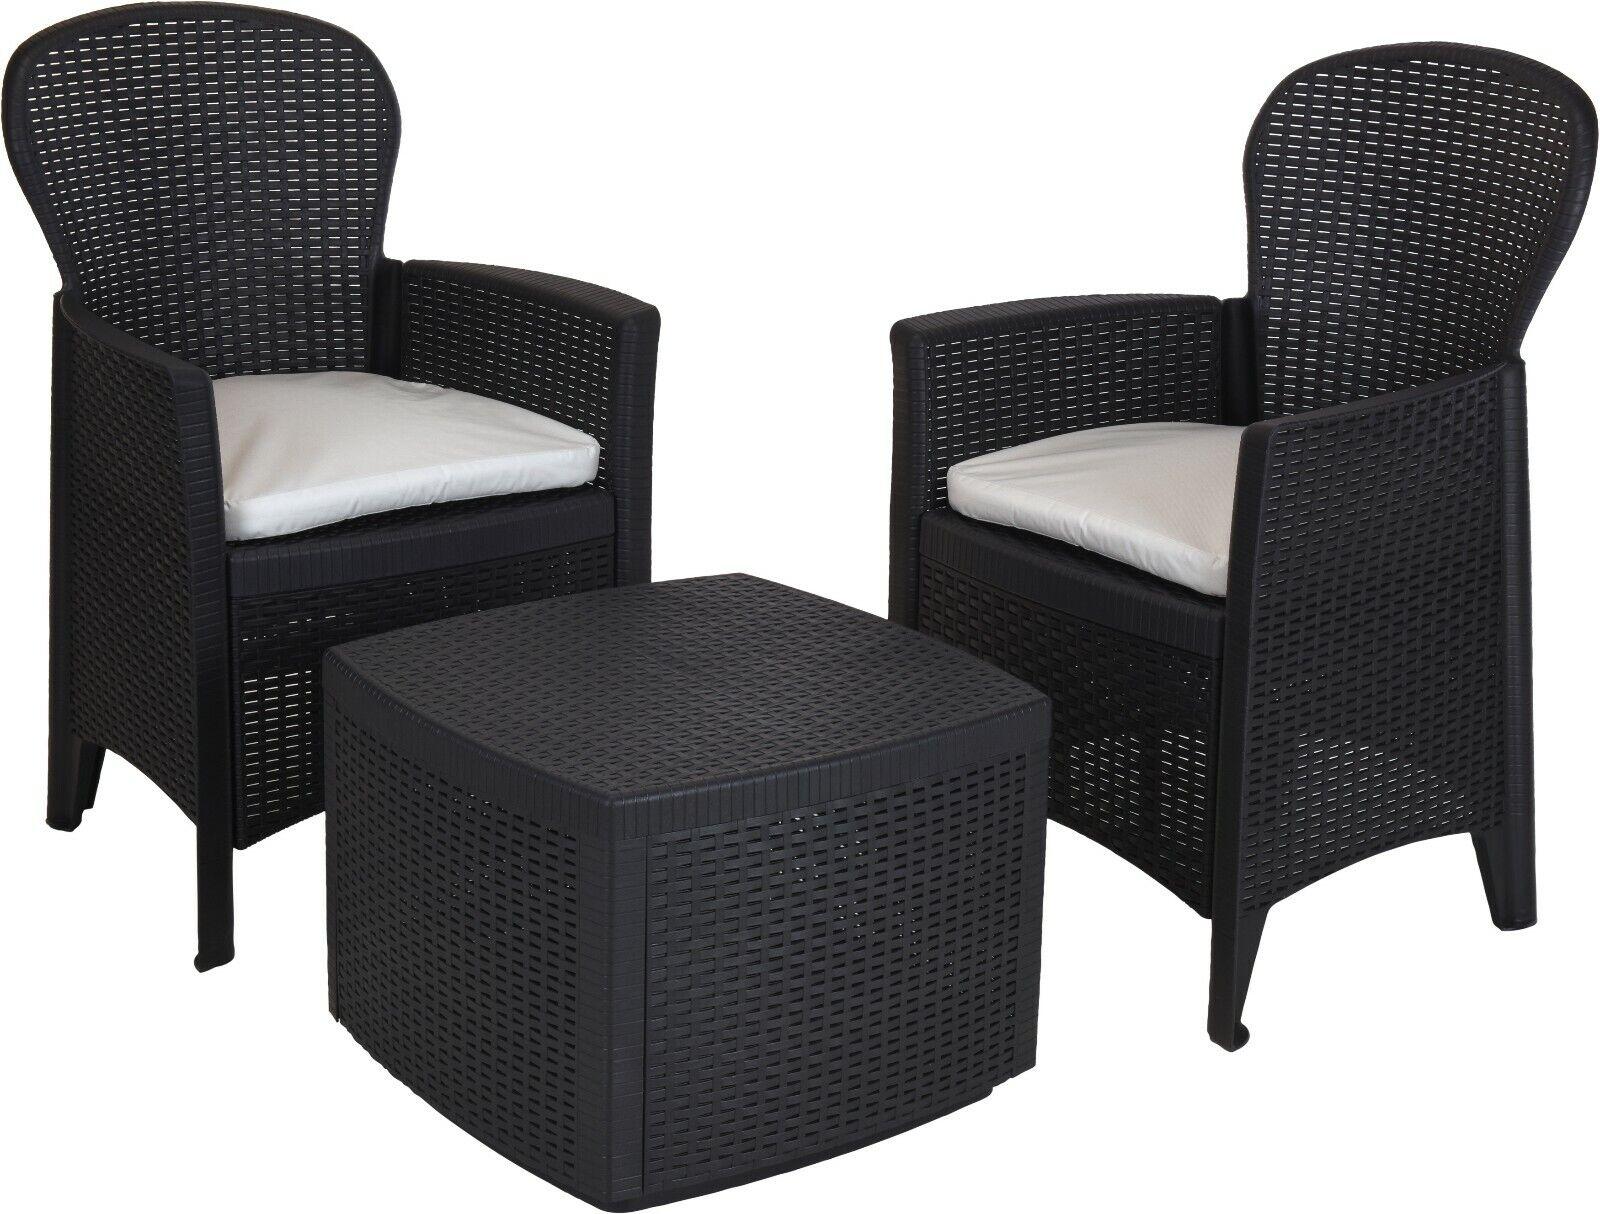 3 Piece Outdoor Patio Chair Table Lounge Garden Balcony Set Furniture